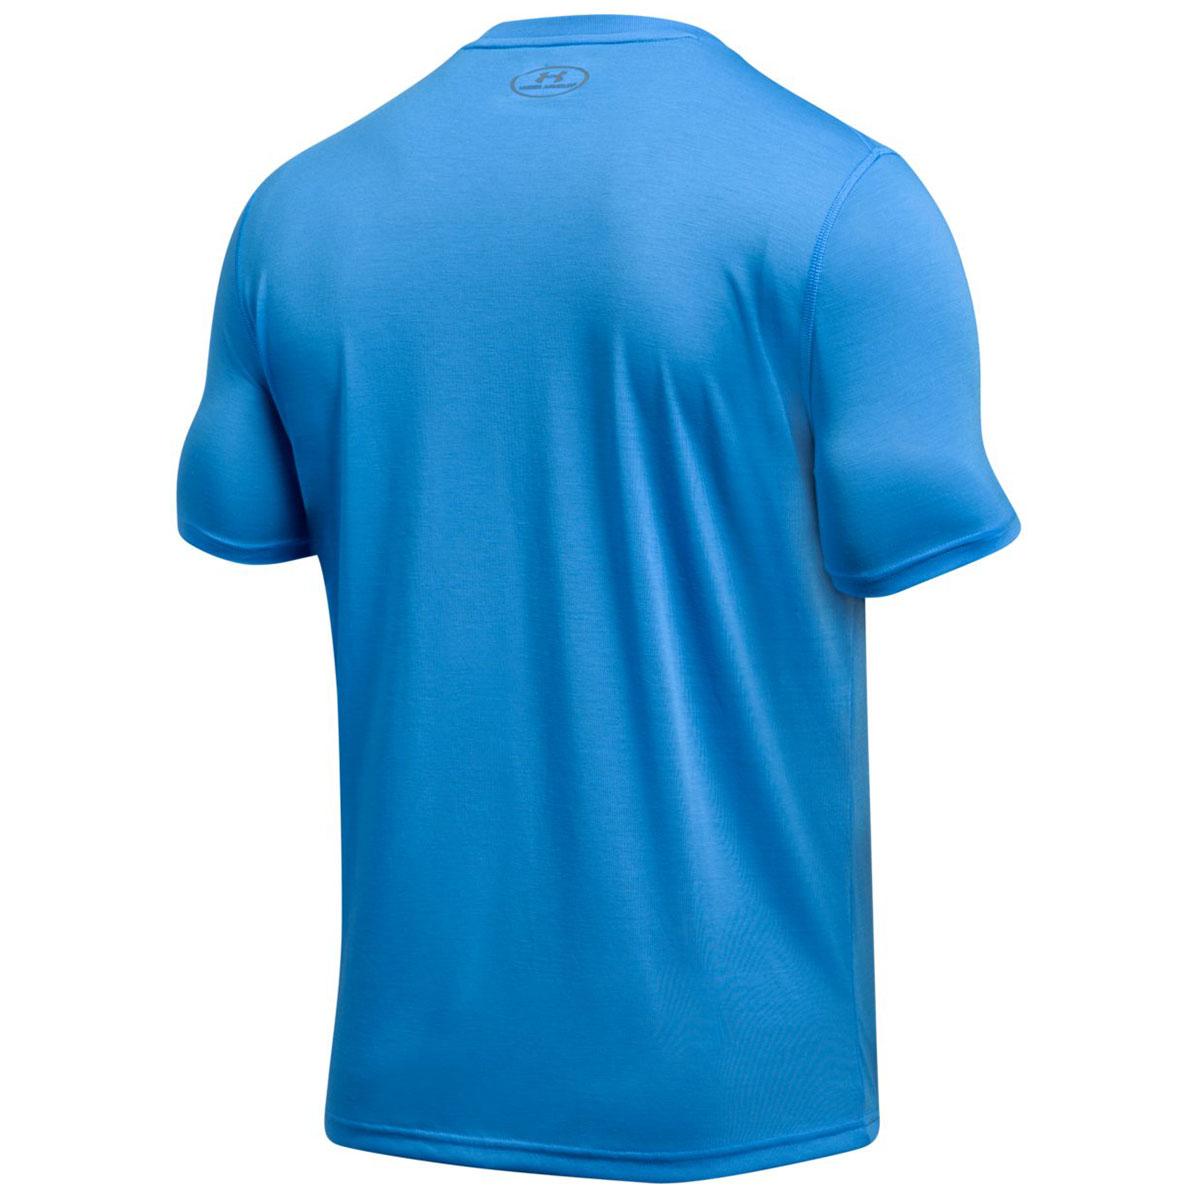 Under-Armour-Mens-UA-Threadborne-Fitted-Short-Sleeve-Gym-Tee-Sport-T-Shirt thumbnail 22